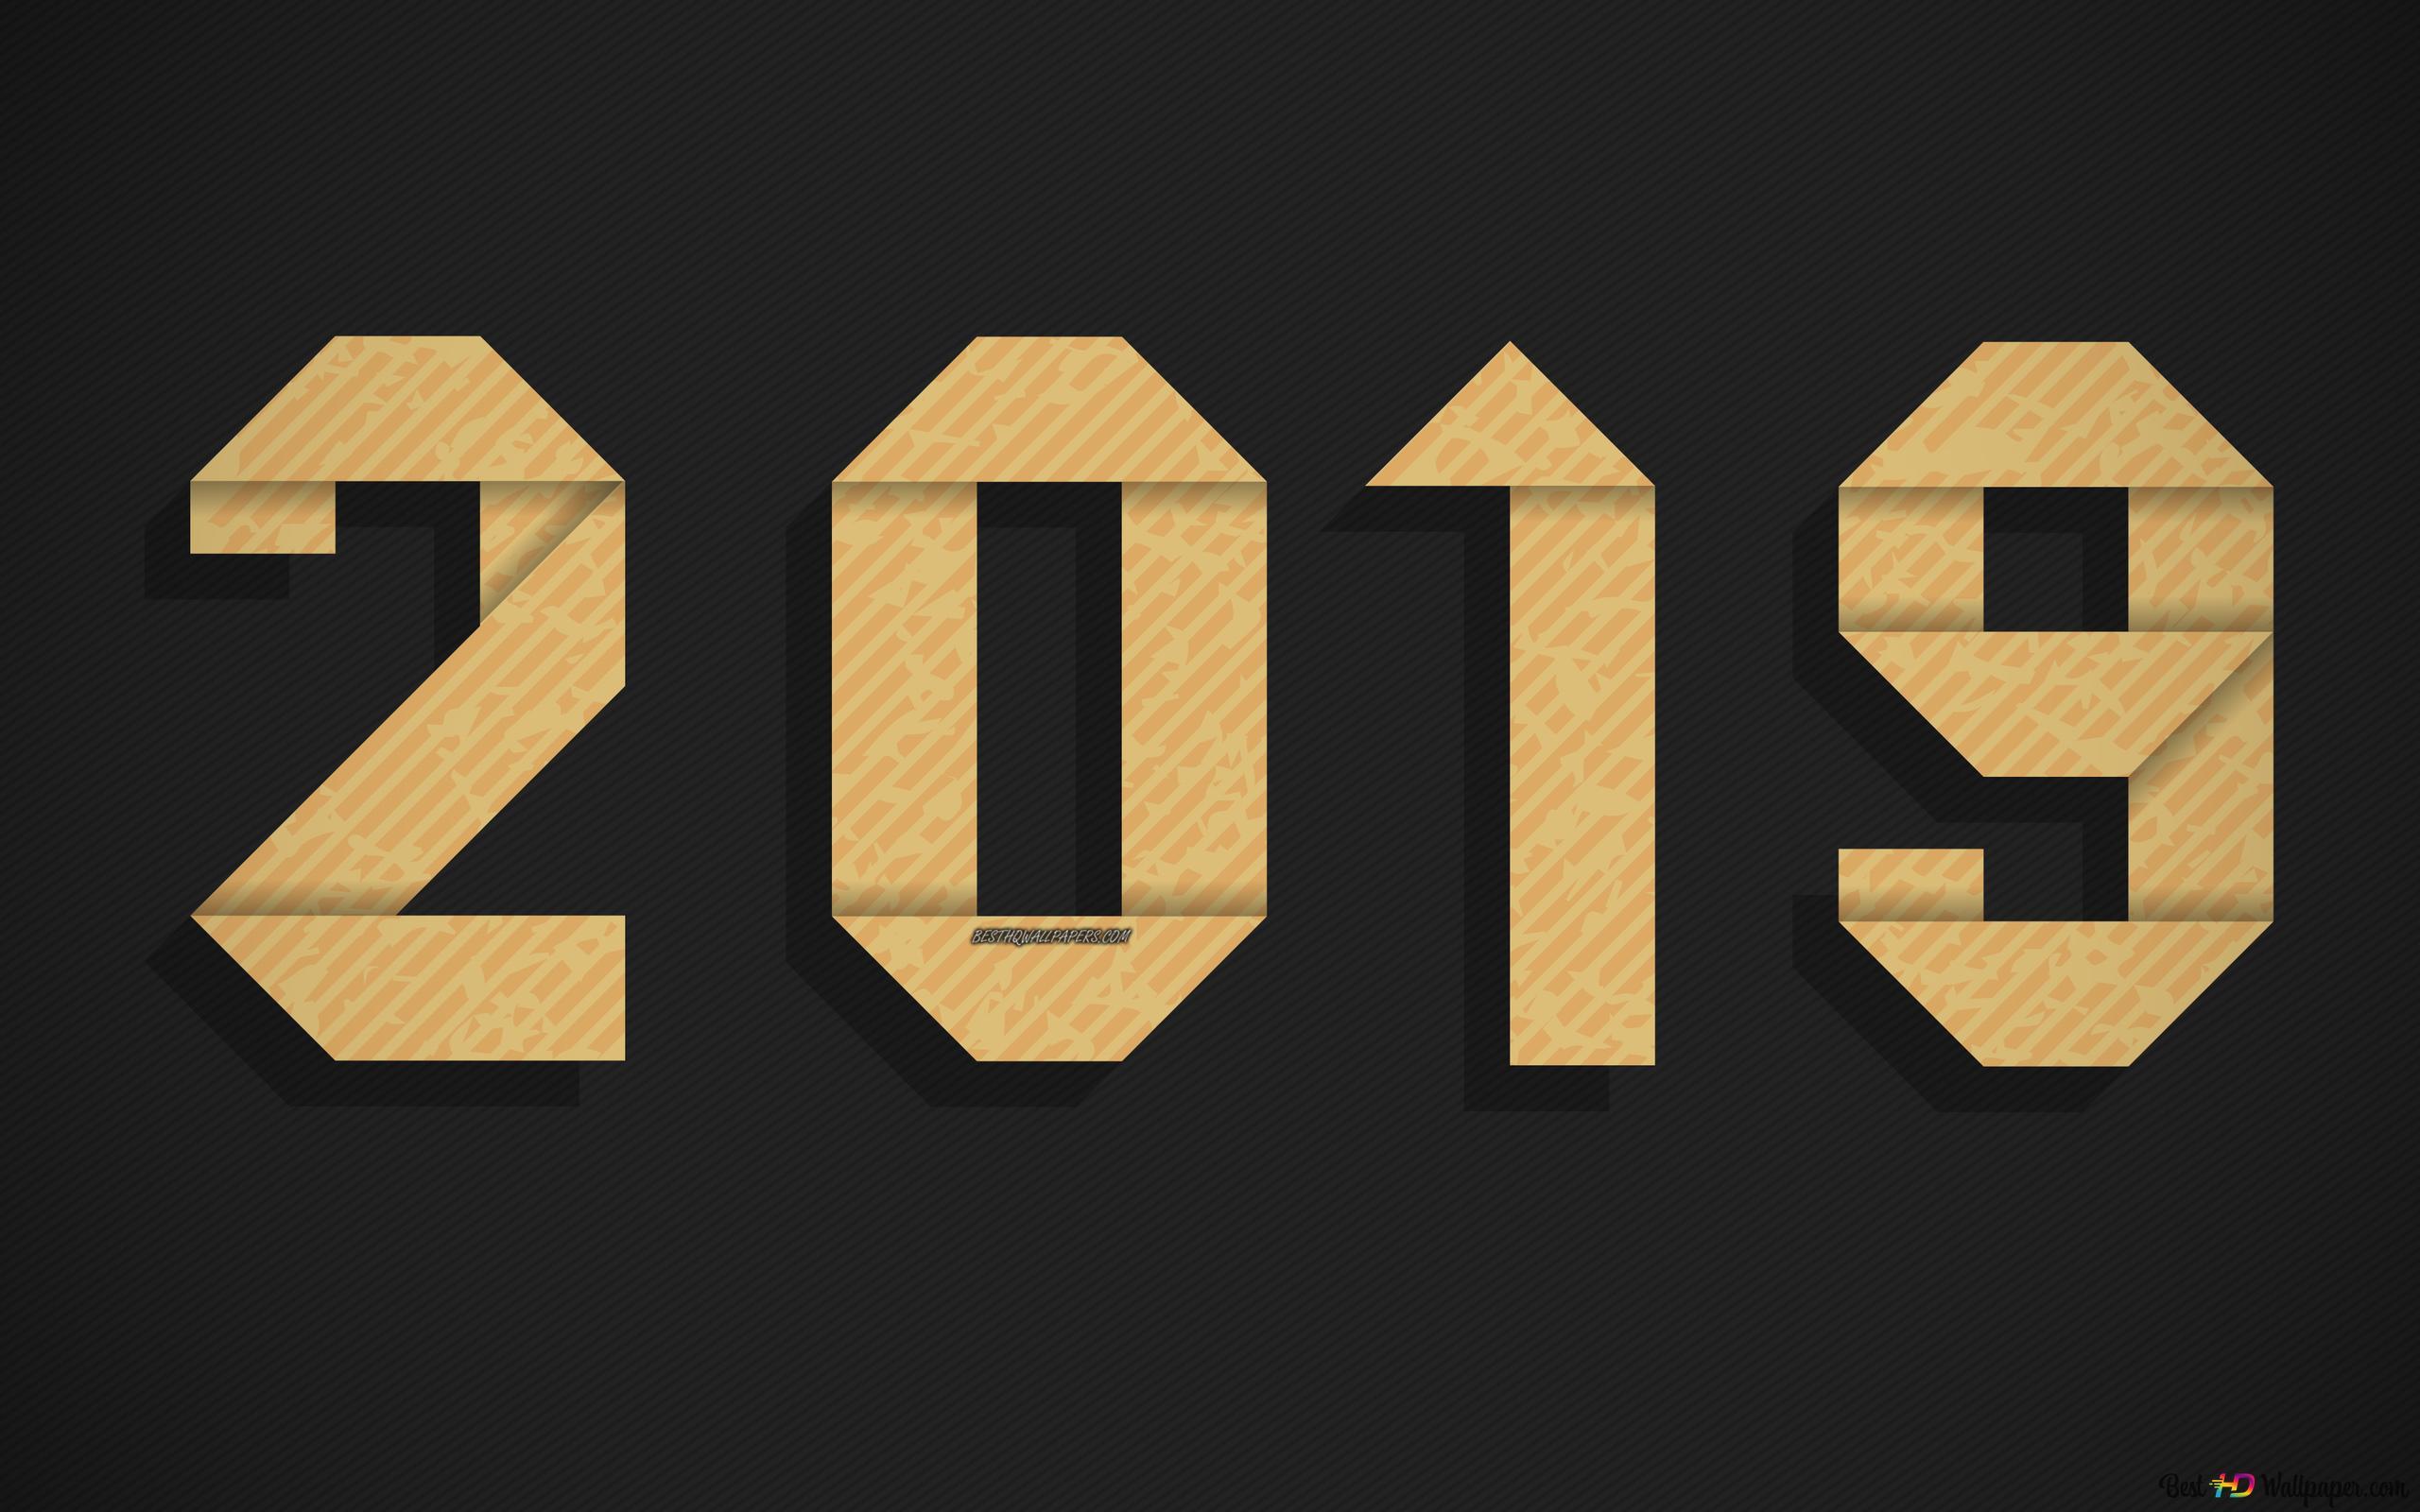 Unfolding Year 2019 Hd Wallpaper Download